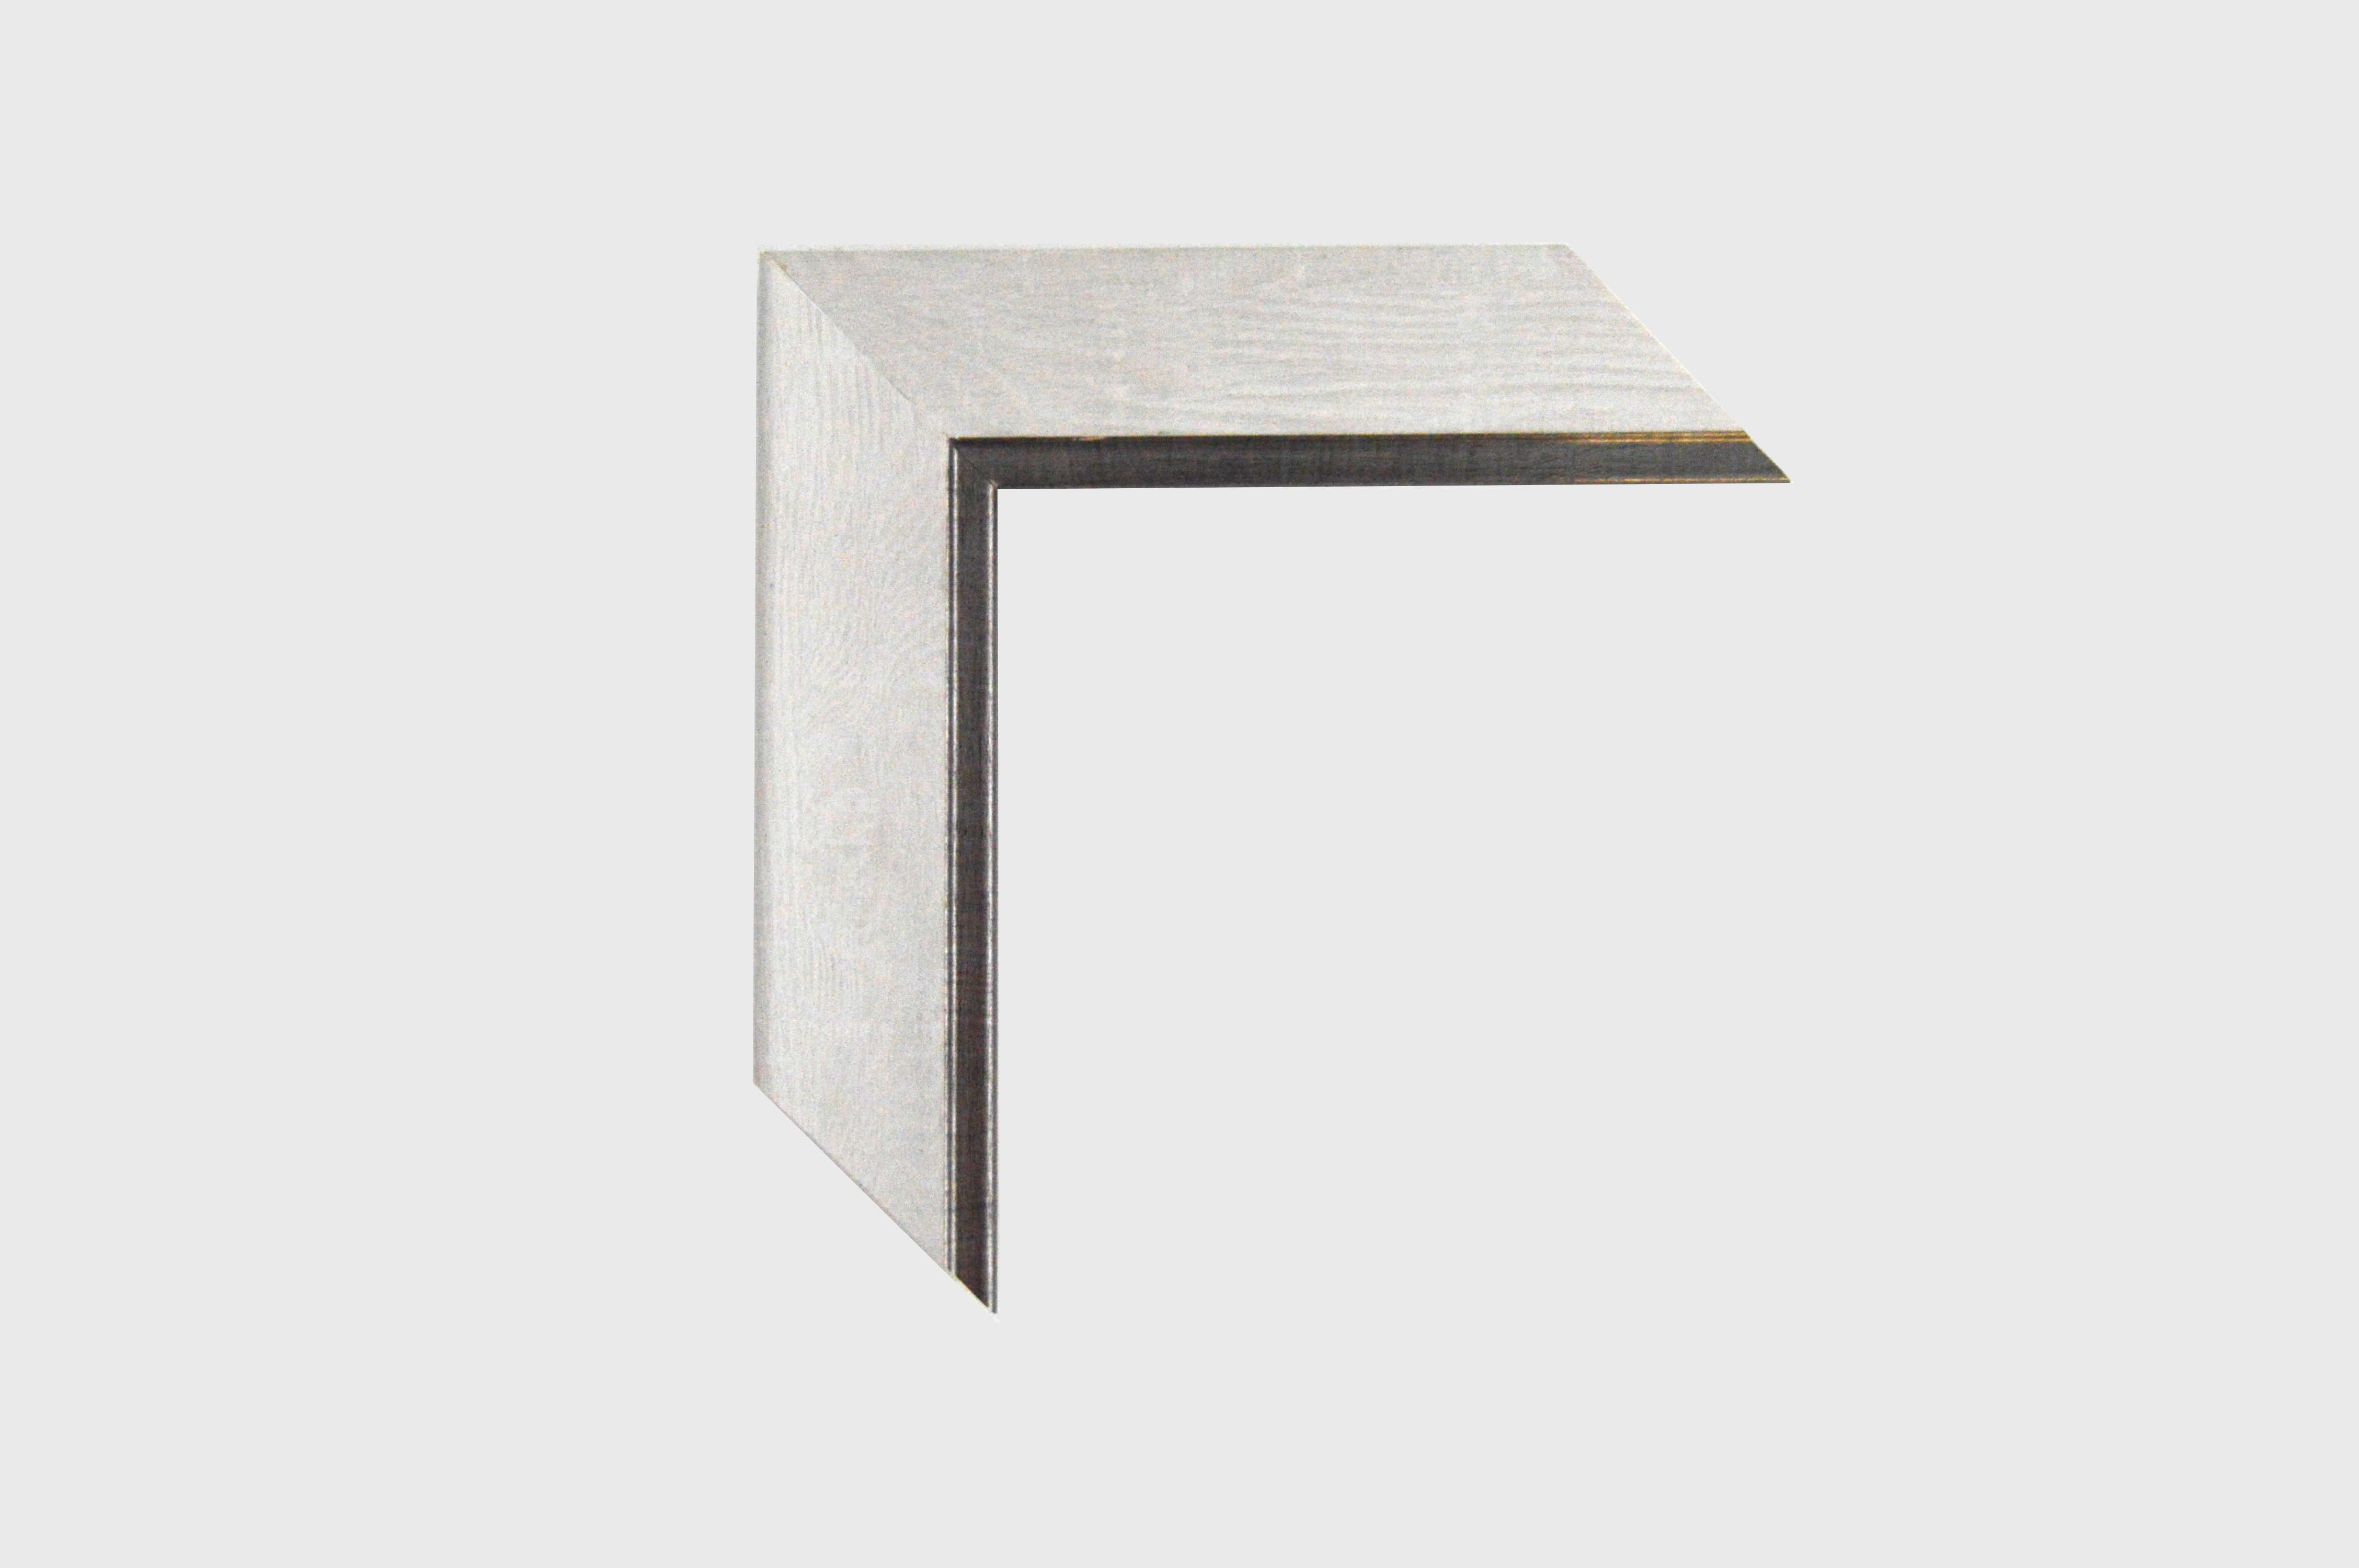 00922-170-BLANCO-ancho4.4cm